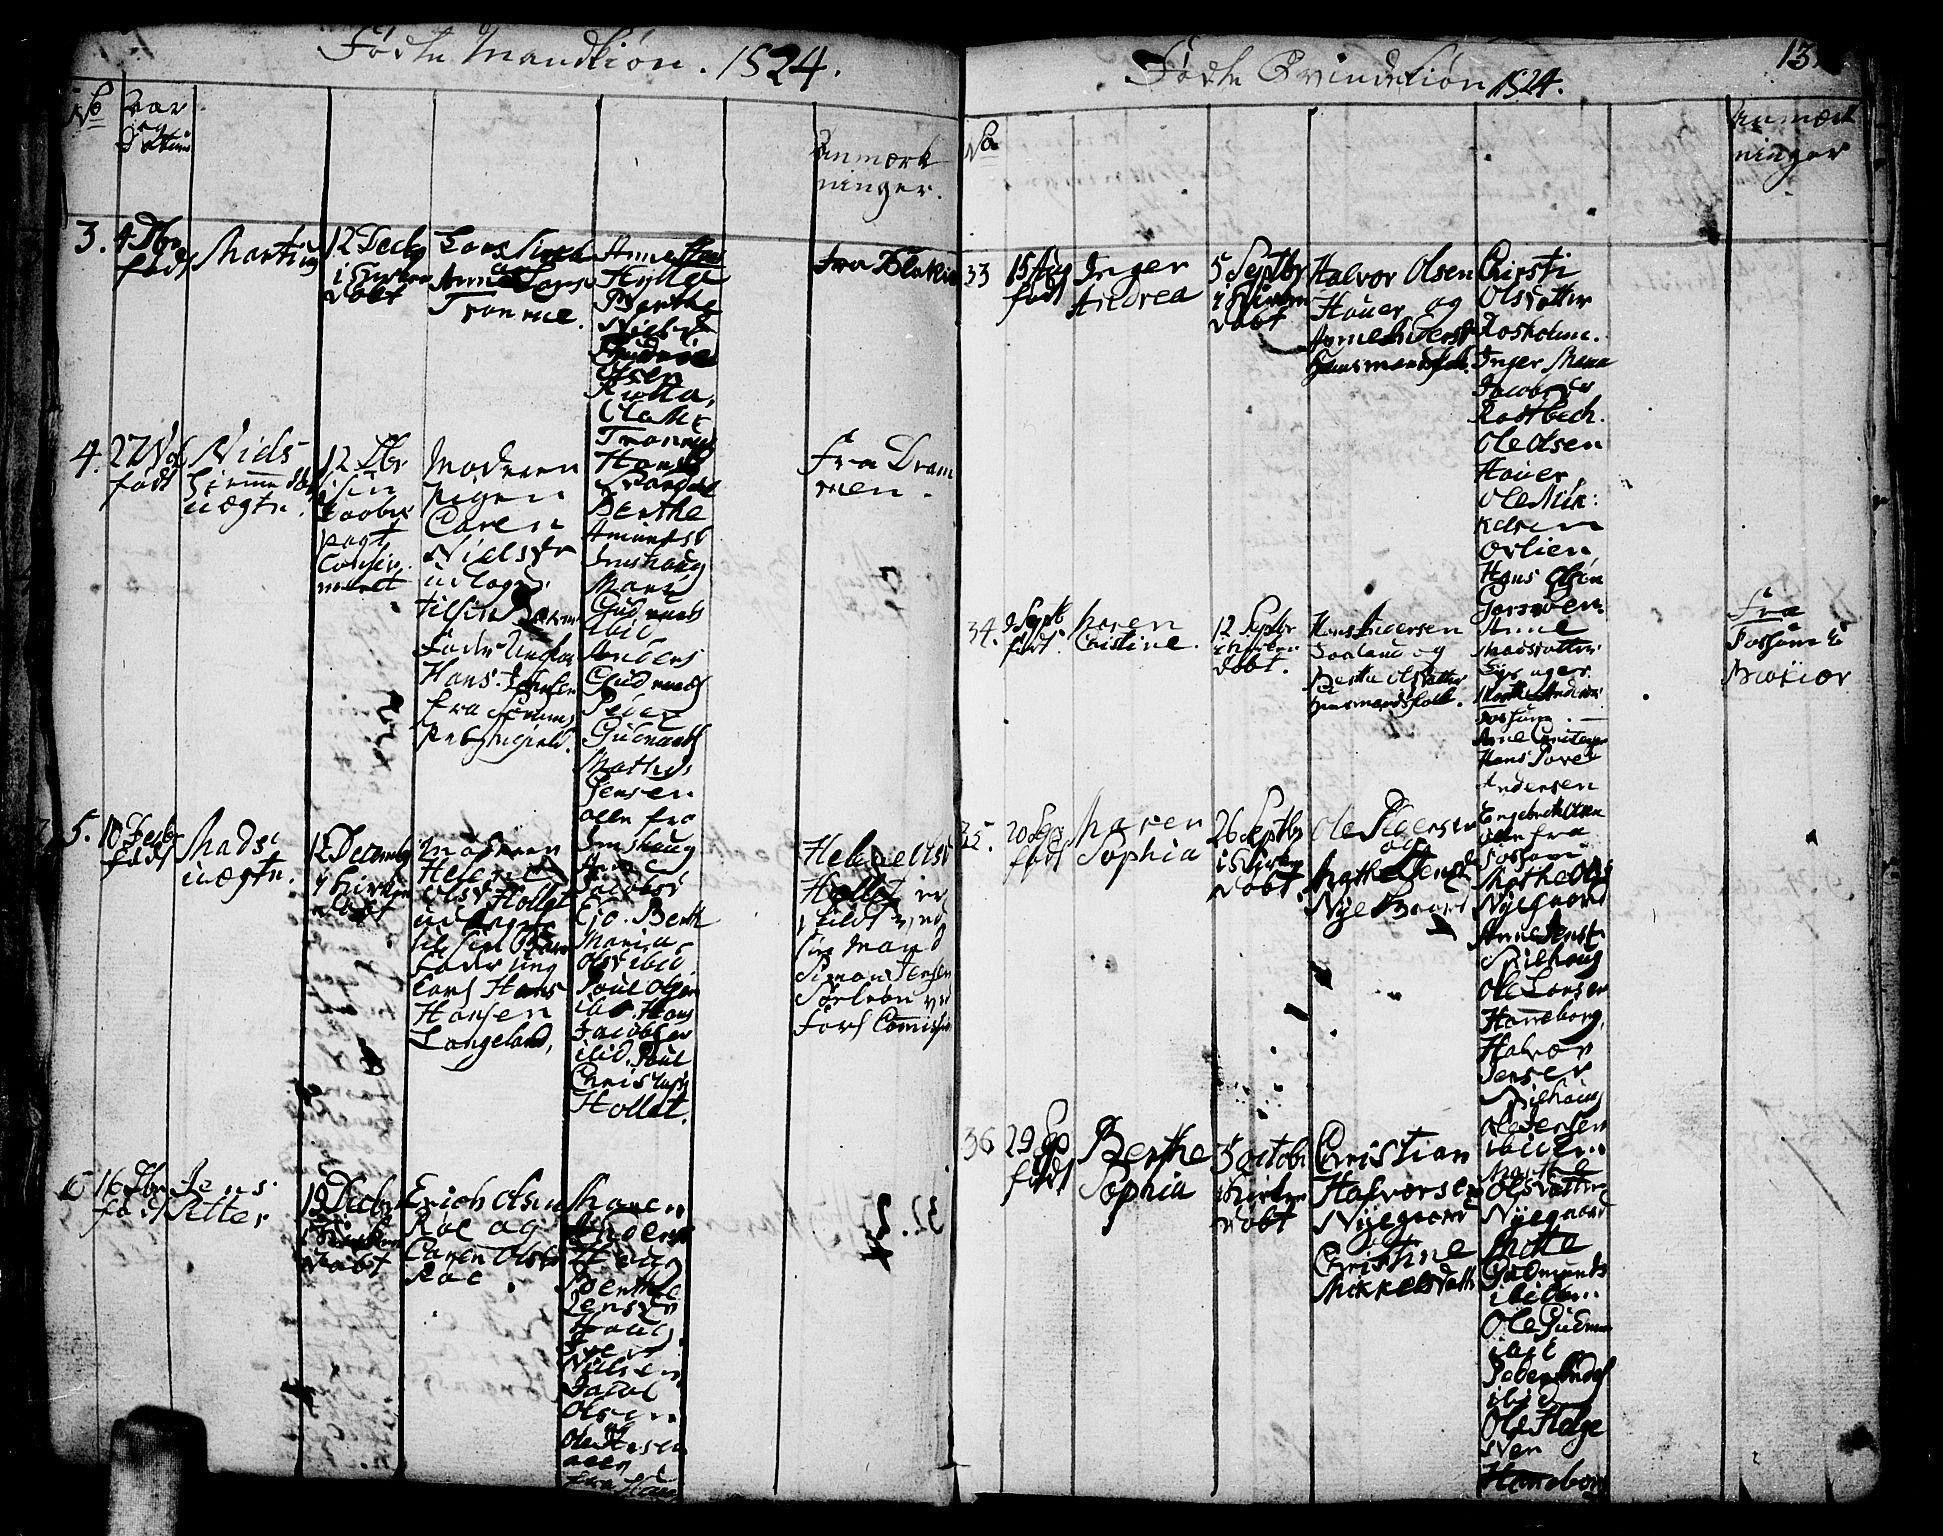 SAO, Aurskog prestekontor Kirkebøker, F/Fa/L0005: Parish register (official) no. I 5, 1814-1829, p. 135